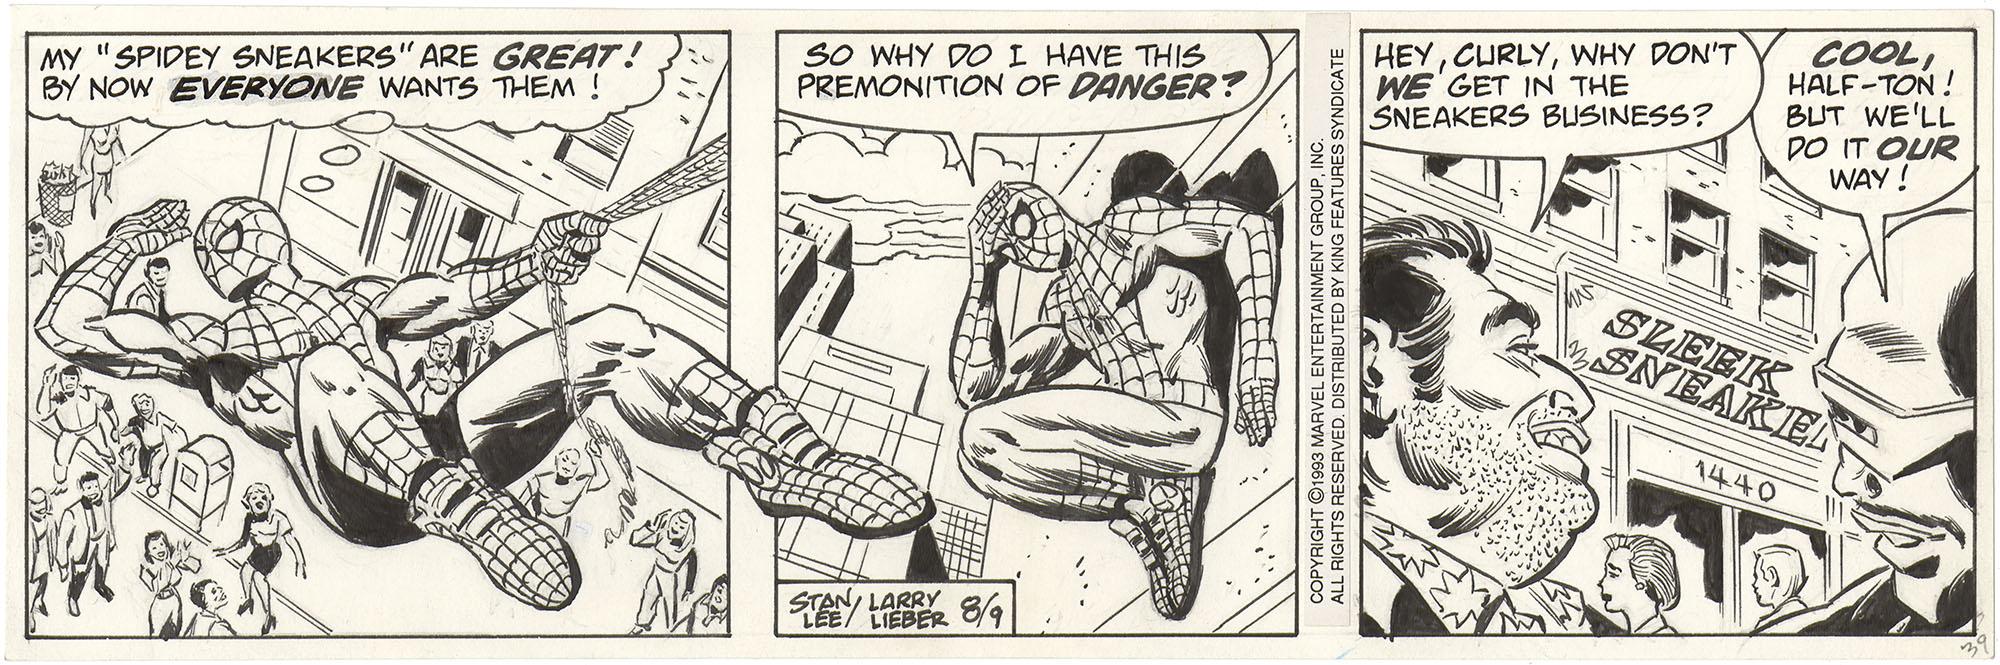 Amazing Spider-Man, Comic Strip, 8/9/93